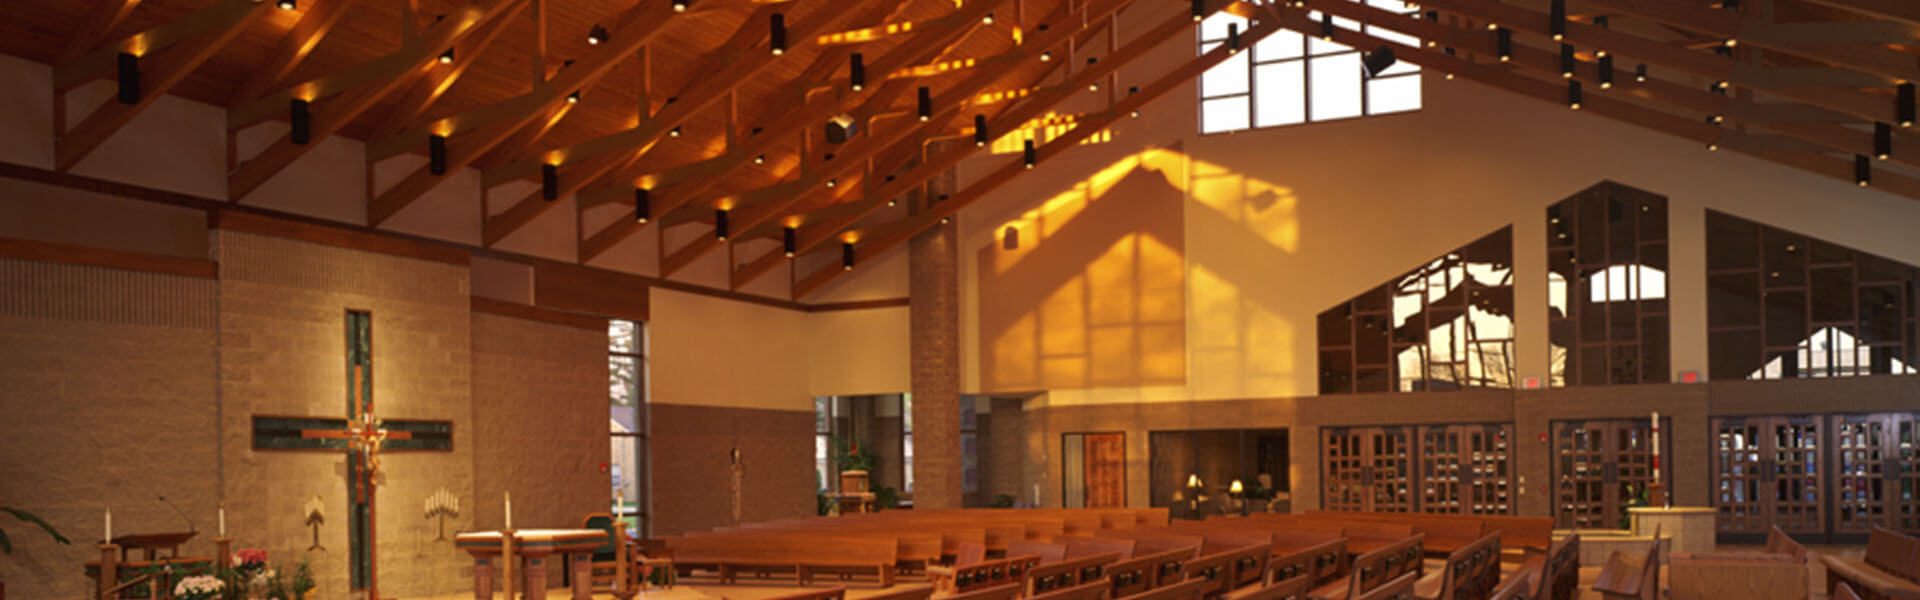 immel-banner_St. Mathew Sanctuary